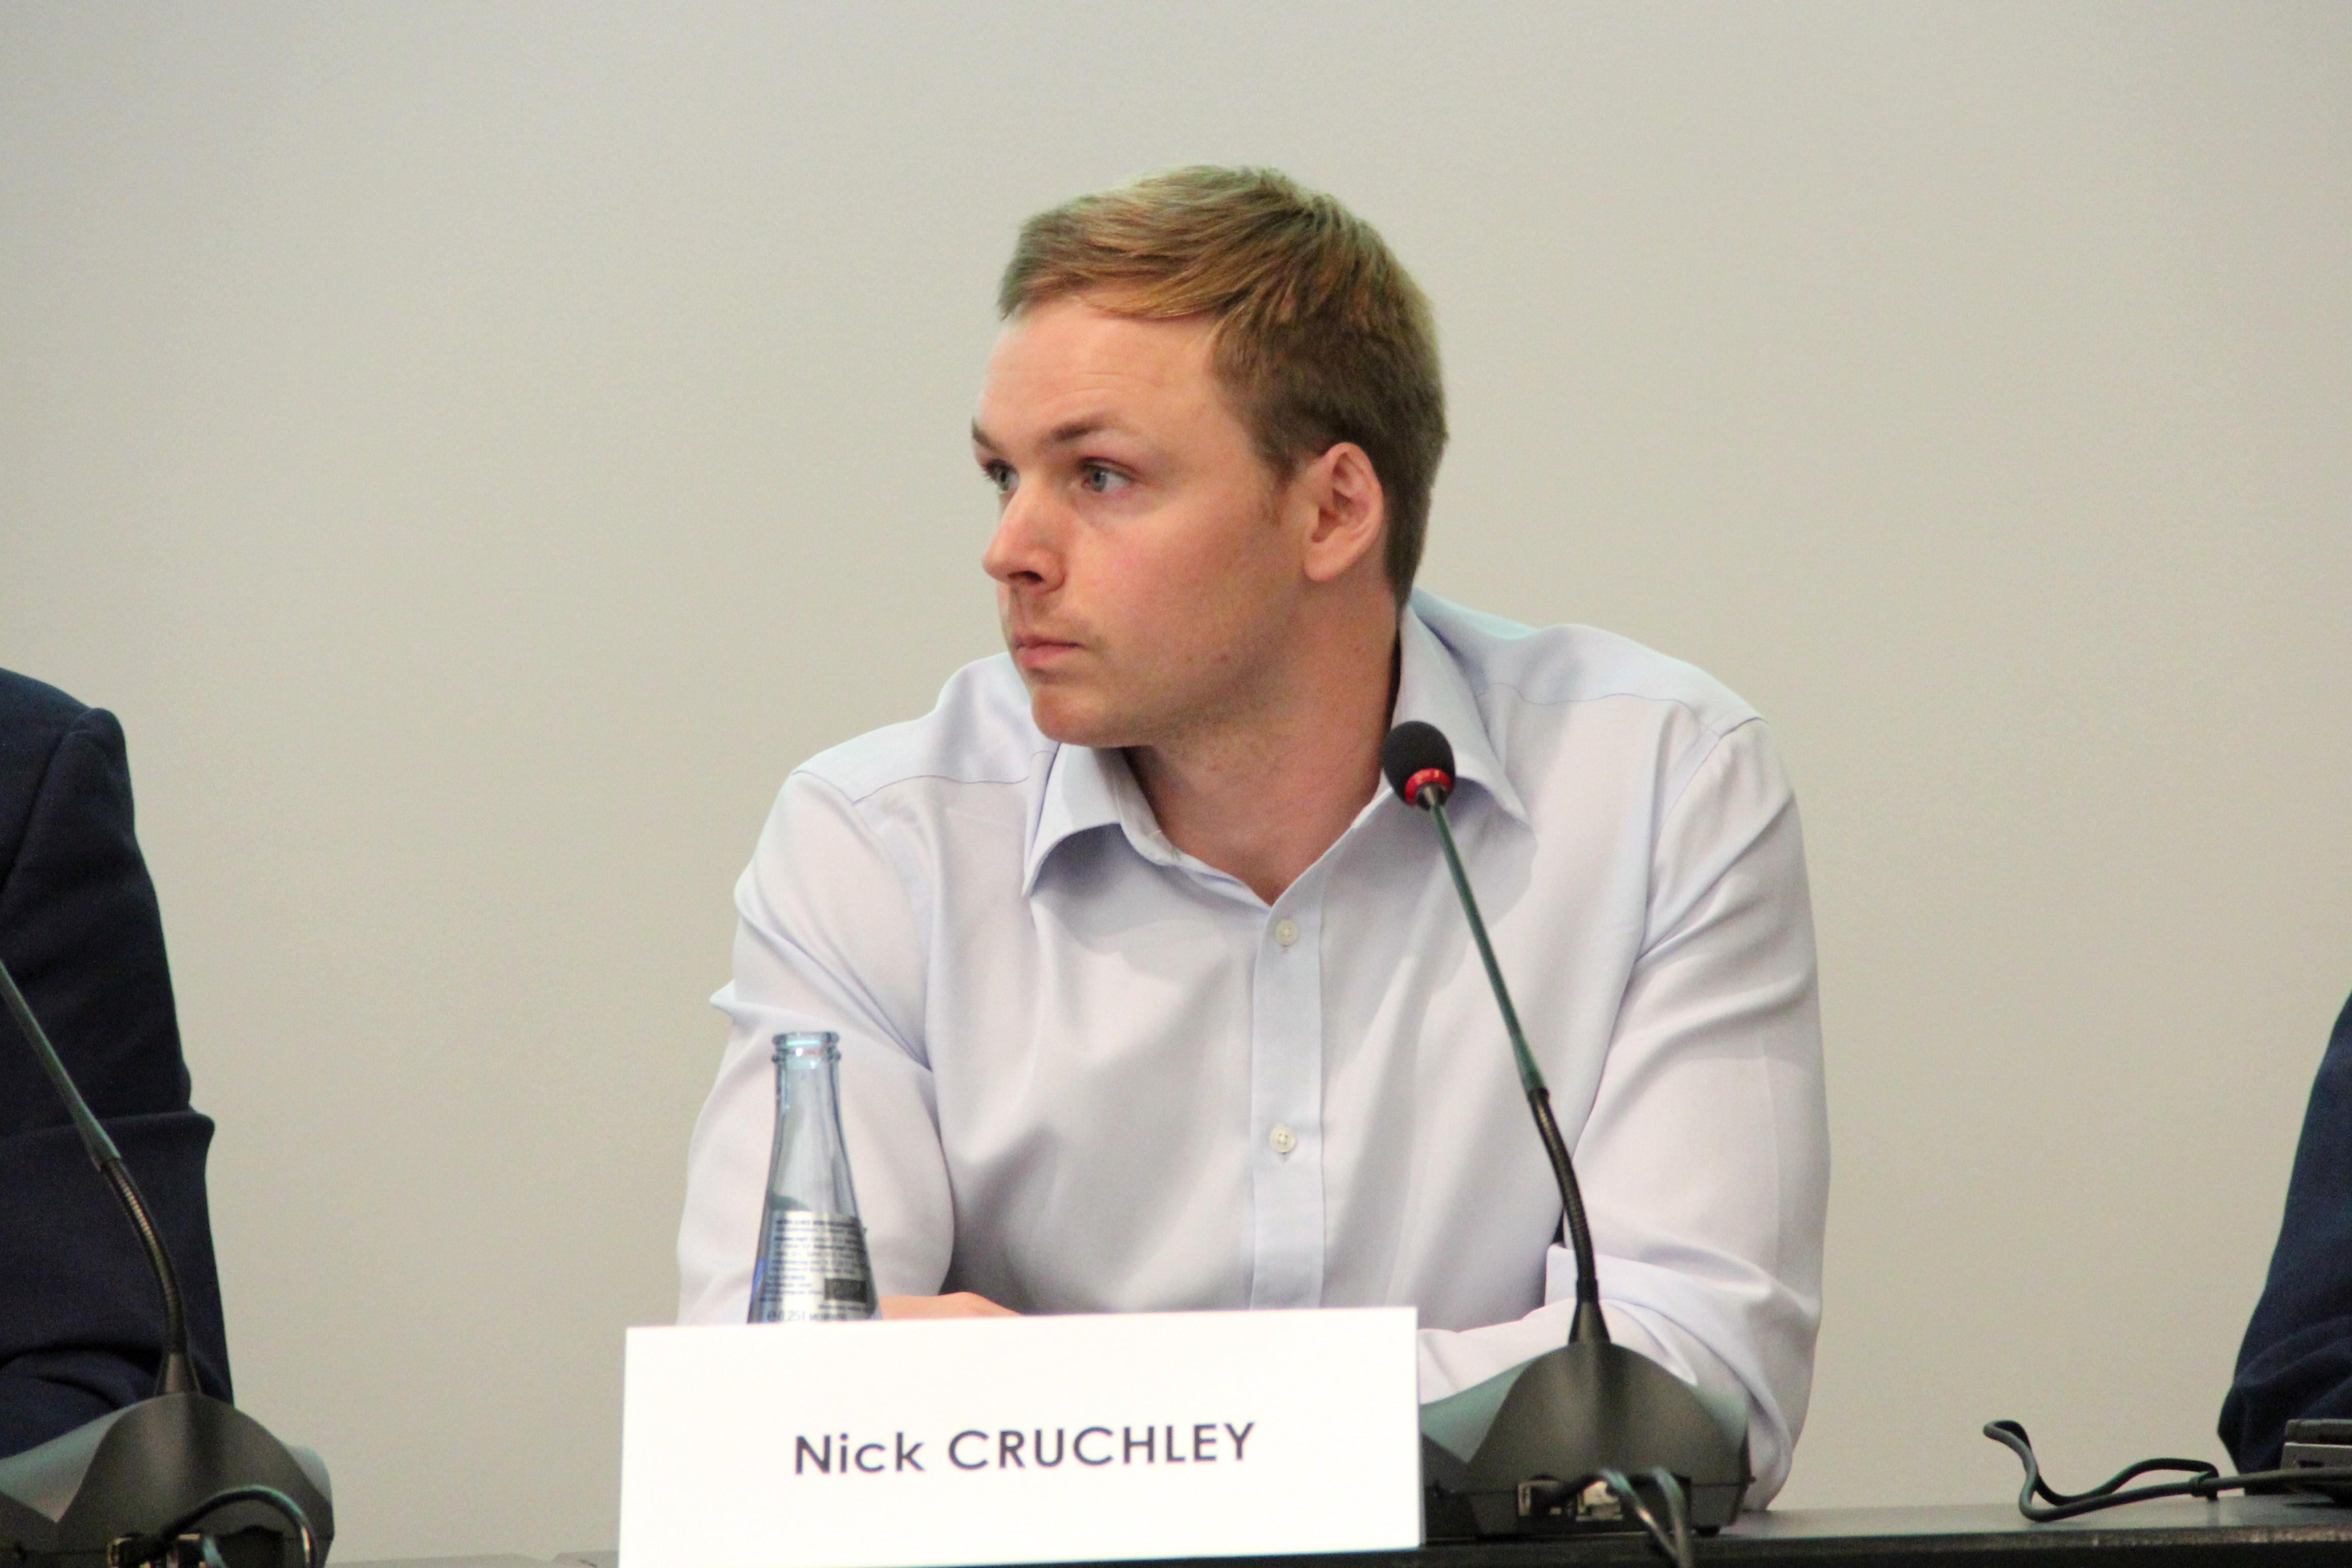 Nick CRUCHLEY